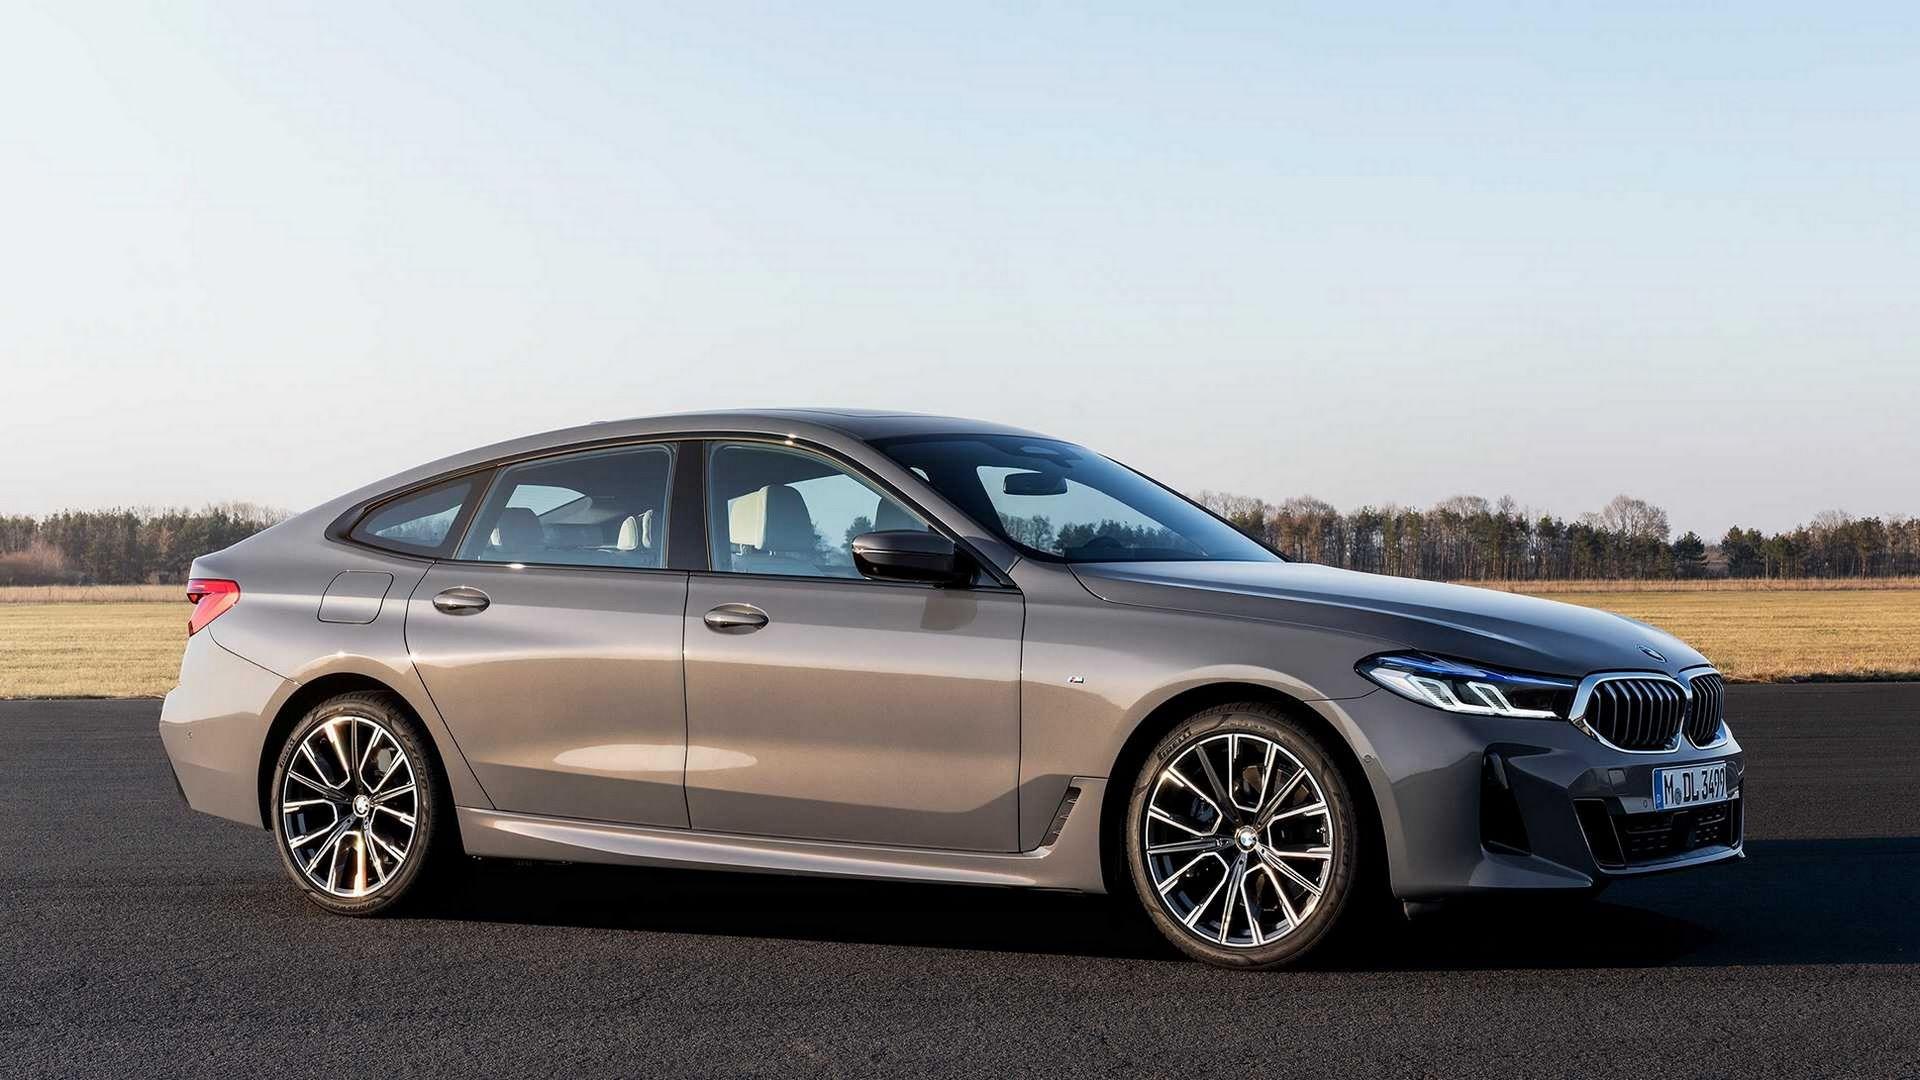 BMW-6-Series-GT-Gran-Turismo-facelift-2021-2